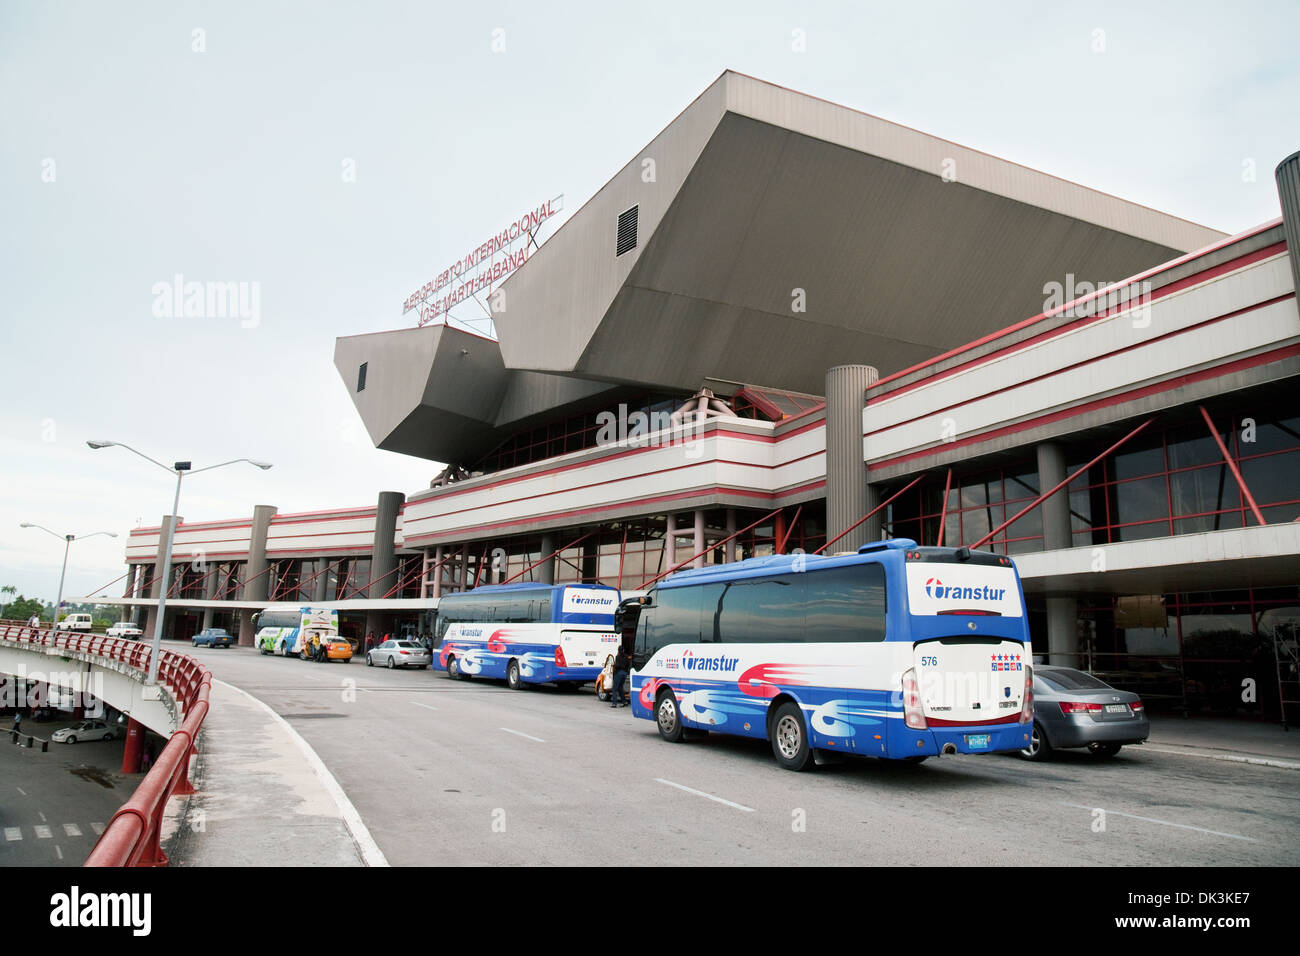 Aeroporto Havana Arrivi : Havana cuba the exterior of the jose marti international airport